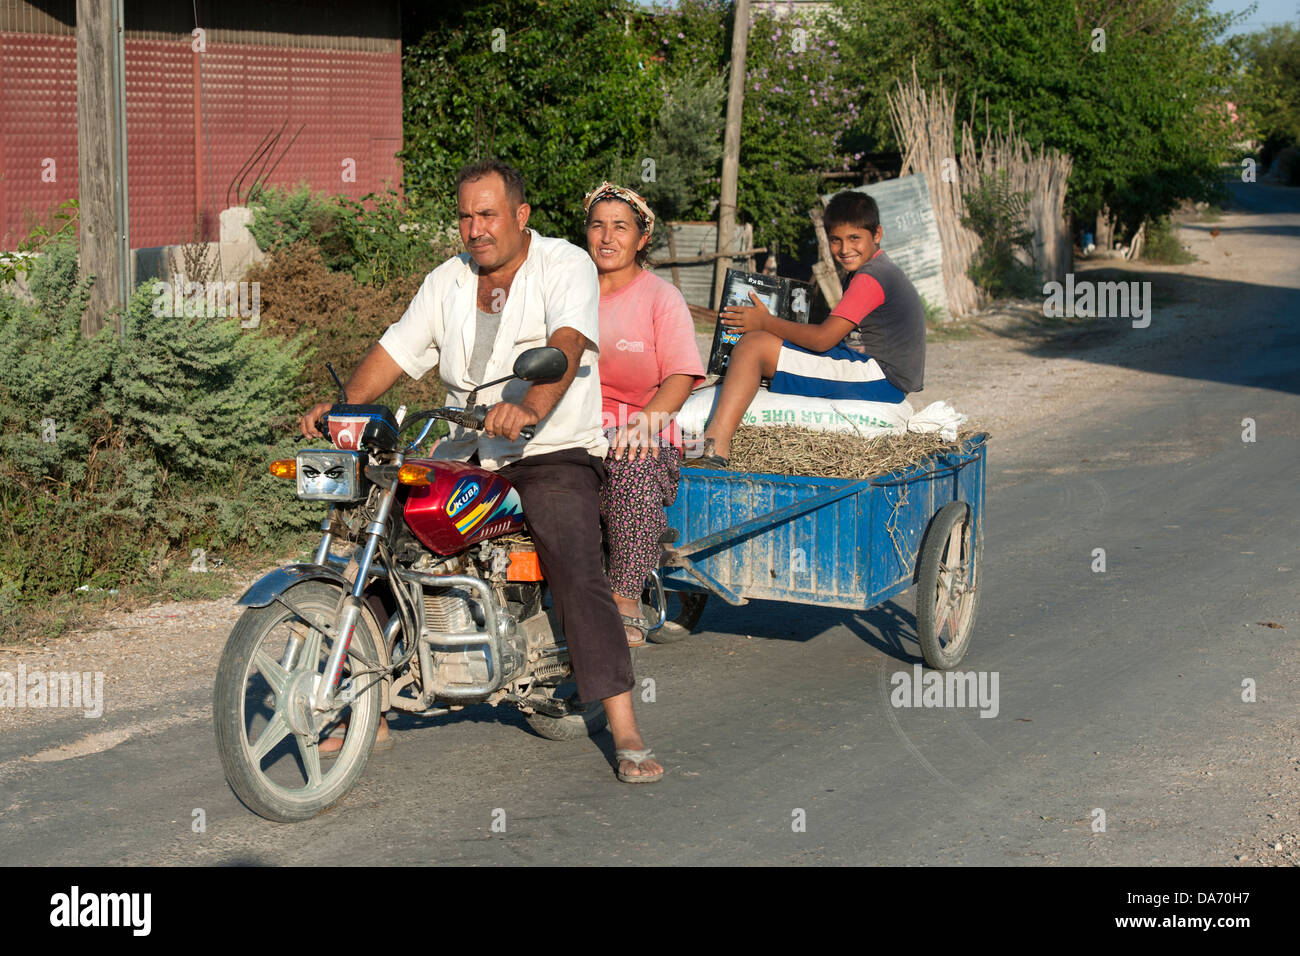 Türkei, Provinz Osmaniye, Familie auf Motorrad - Stock Image